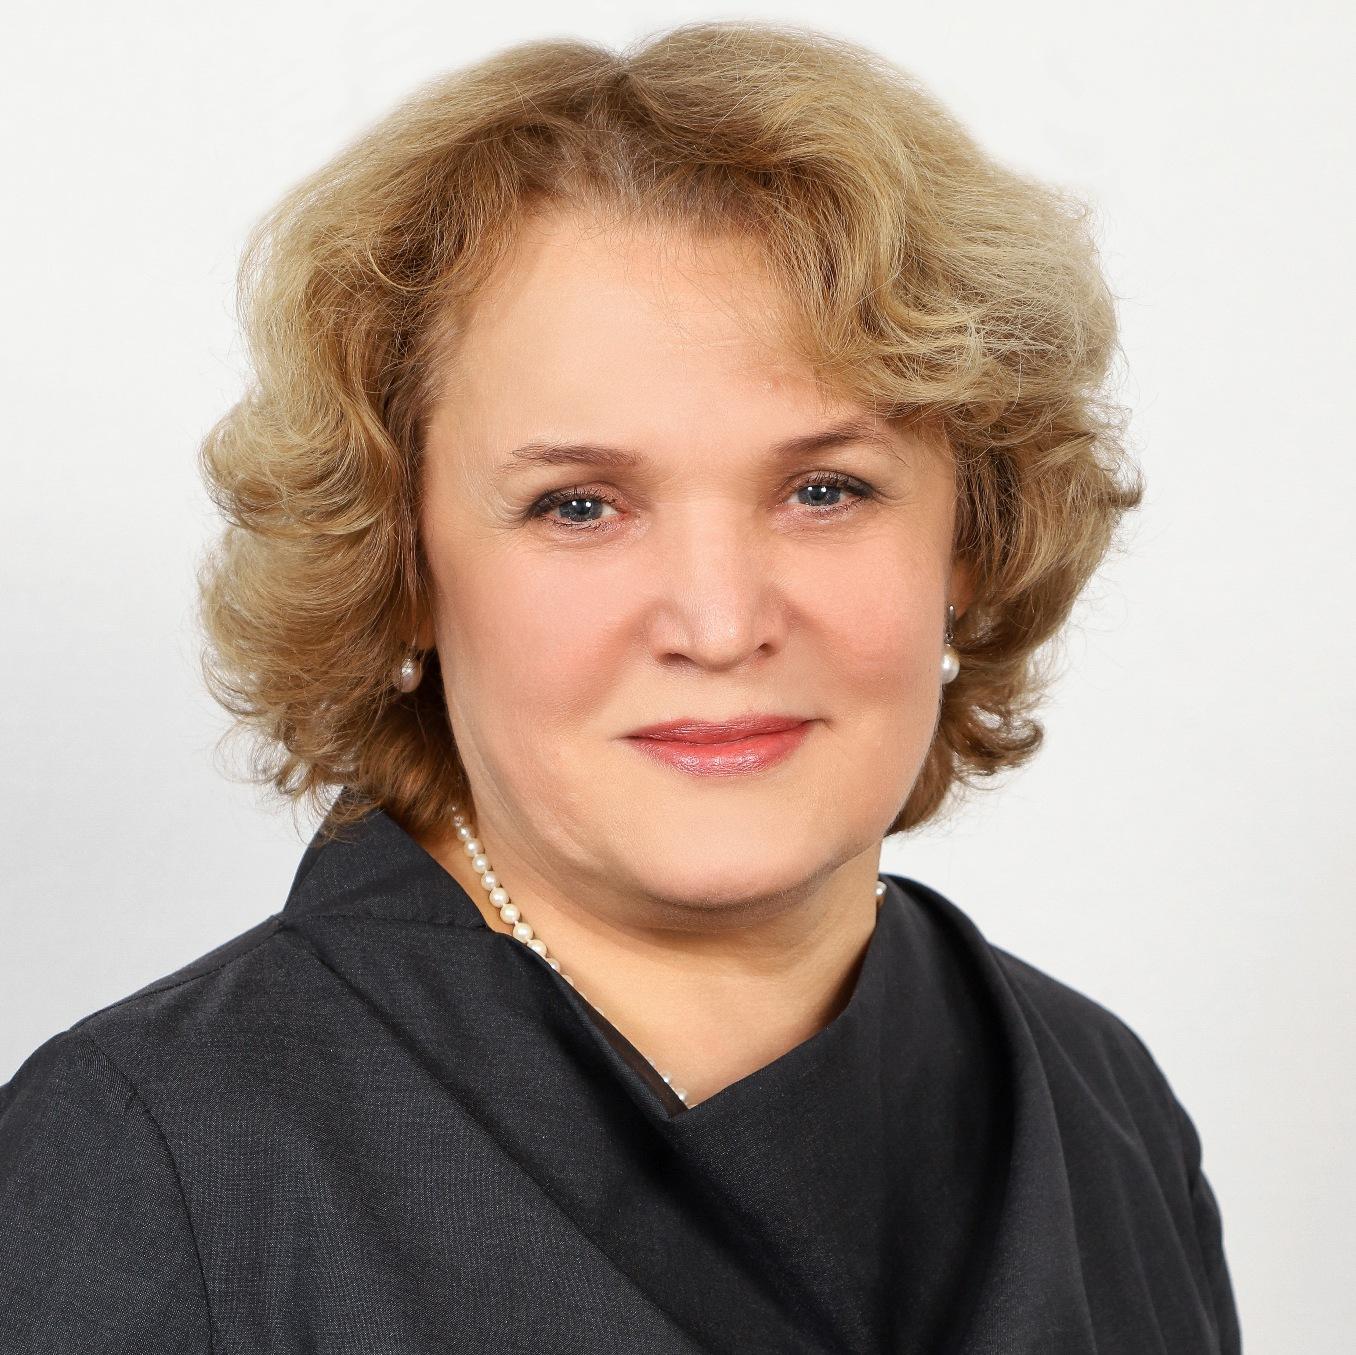 Inguna Karlsone